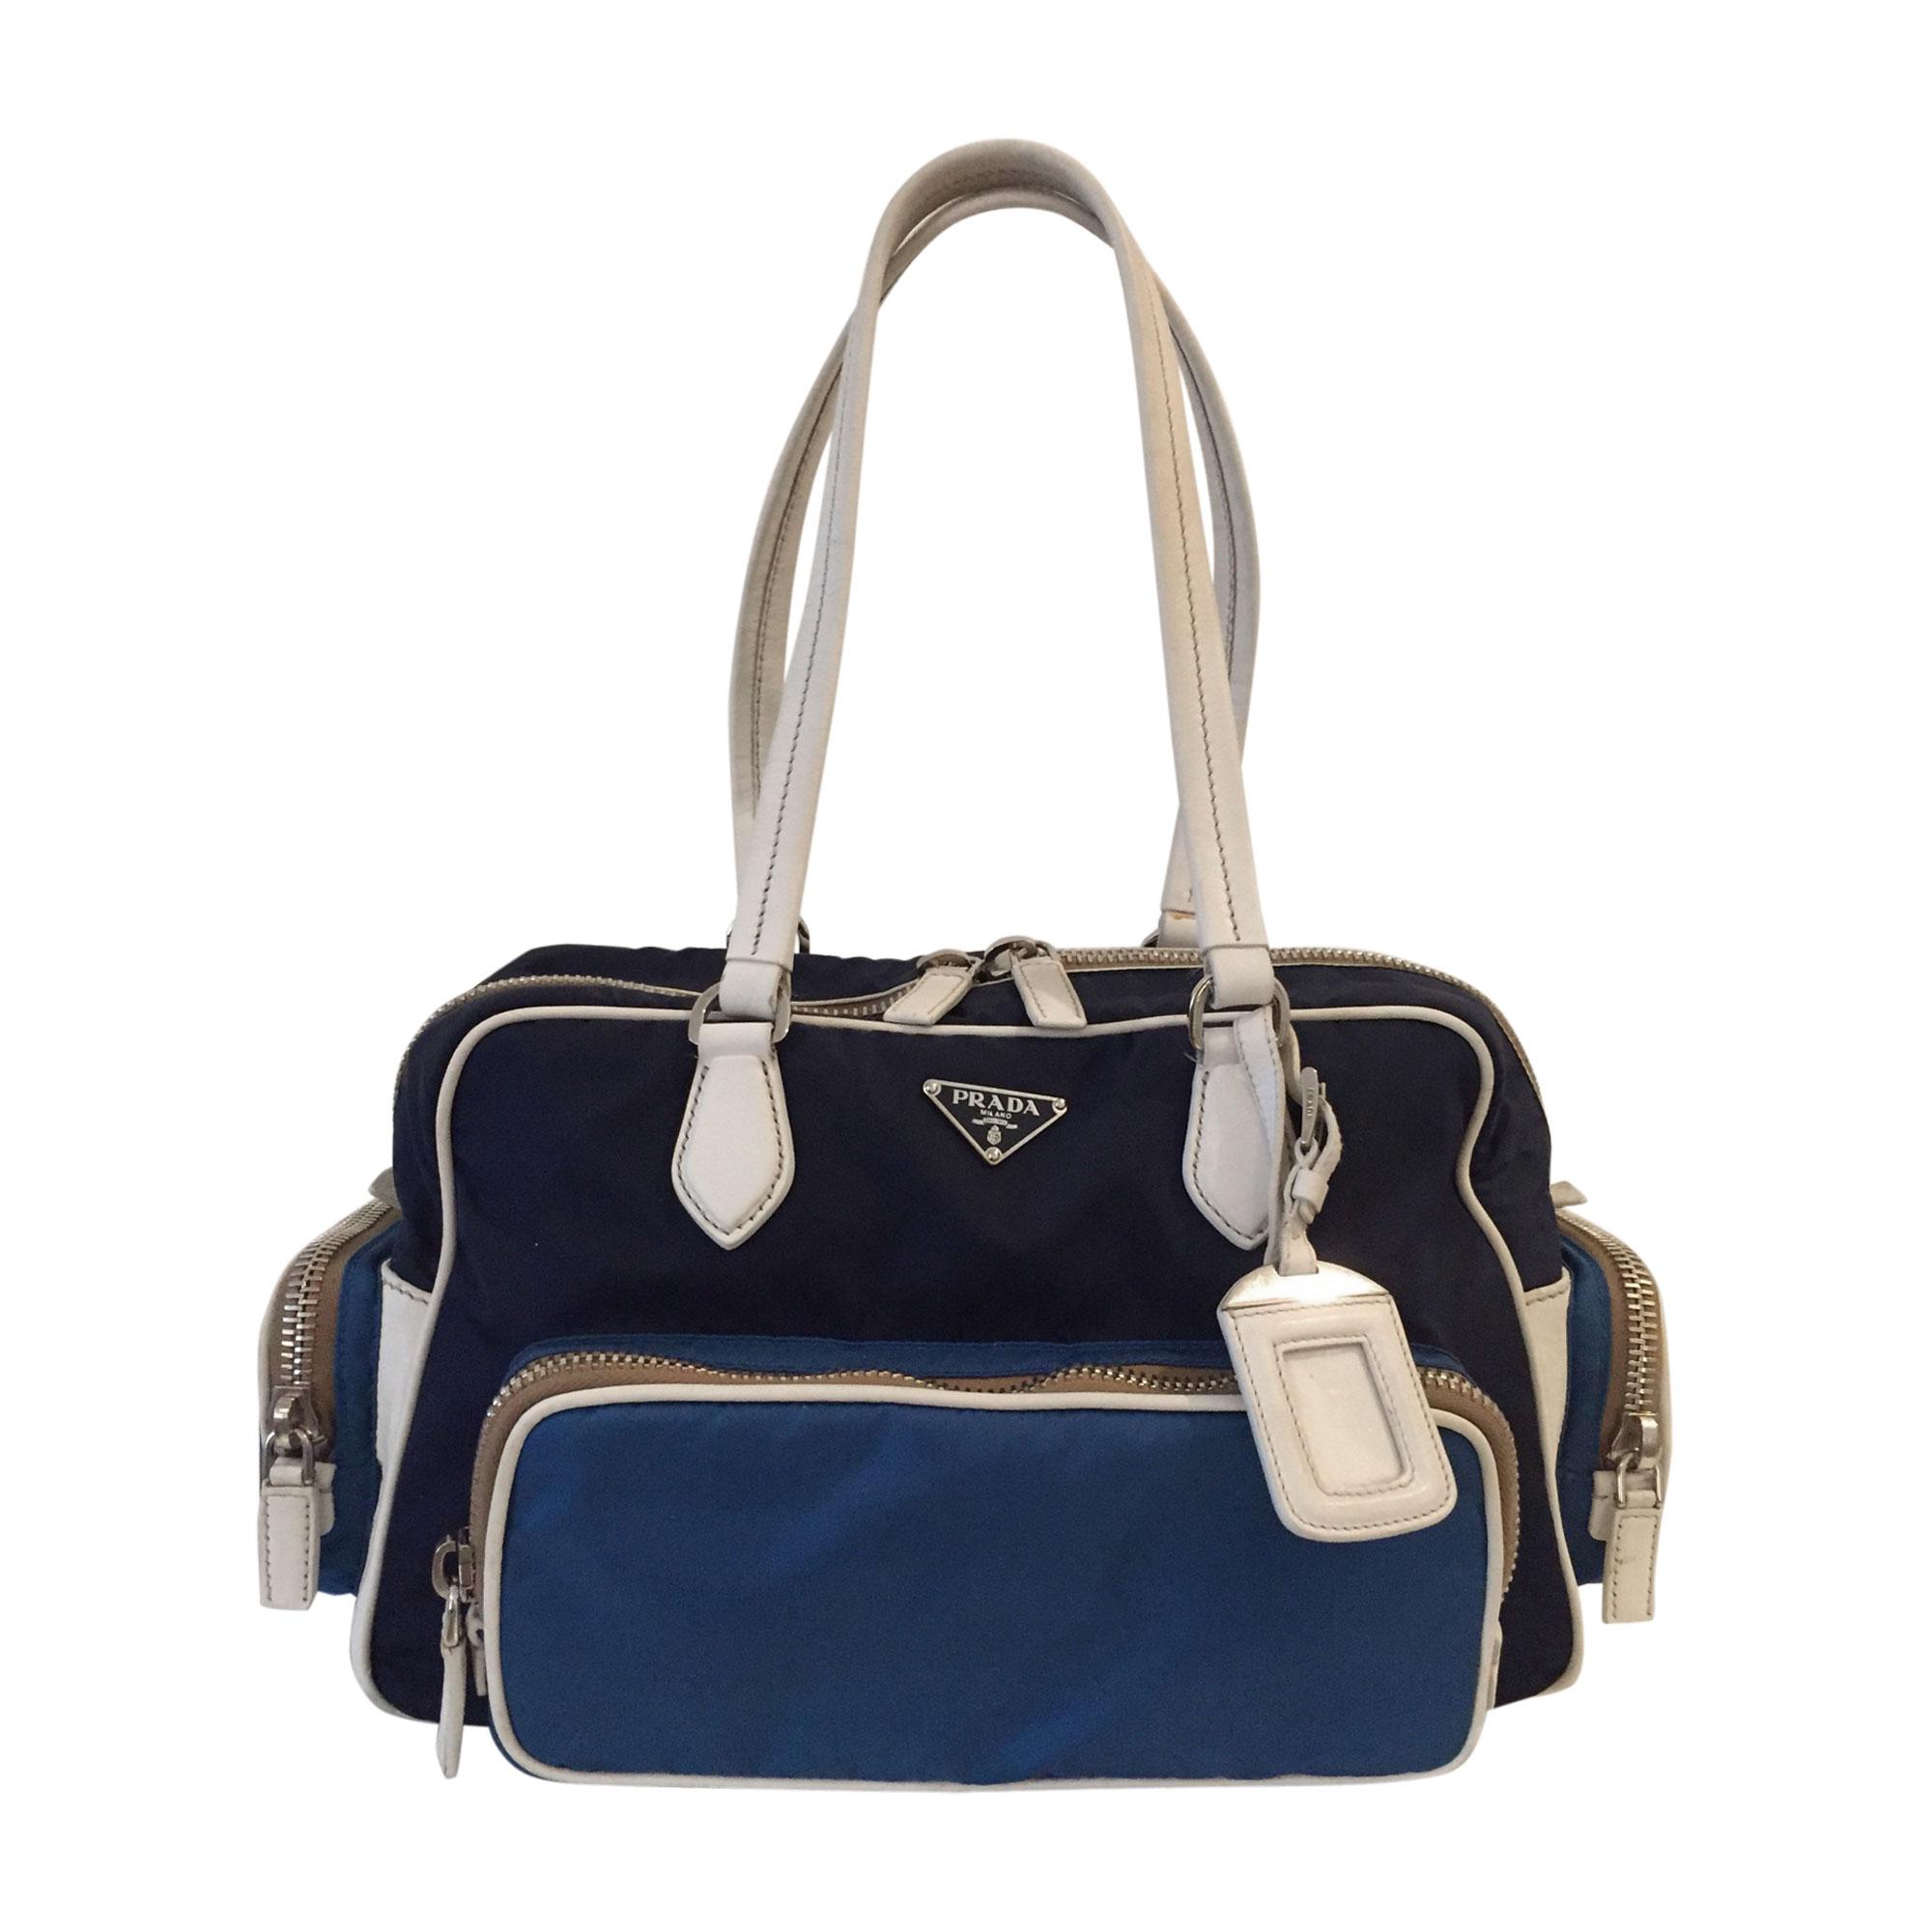 29a7ce74d72021 Leather Handbag PRADA Blue, navy, turquoise